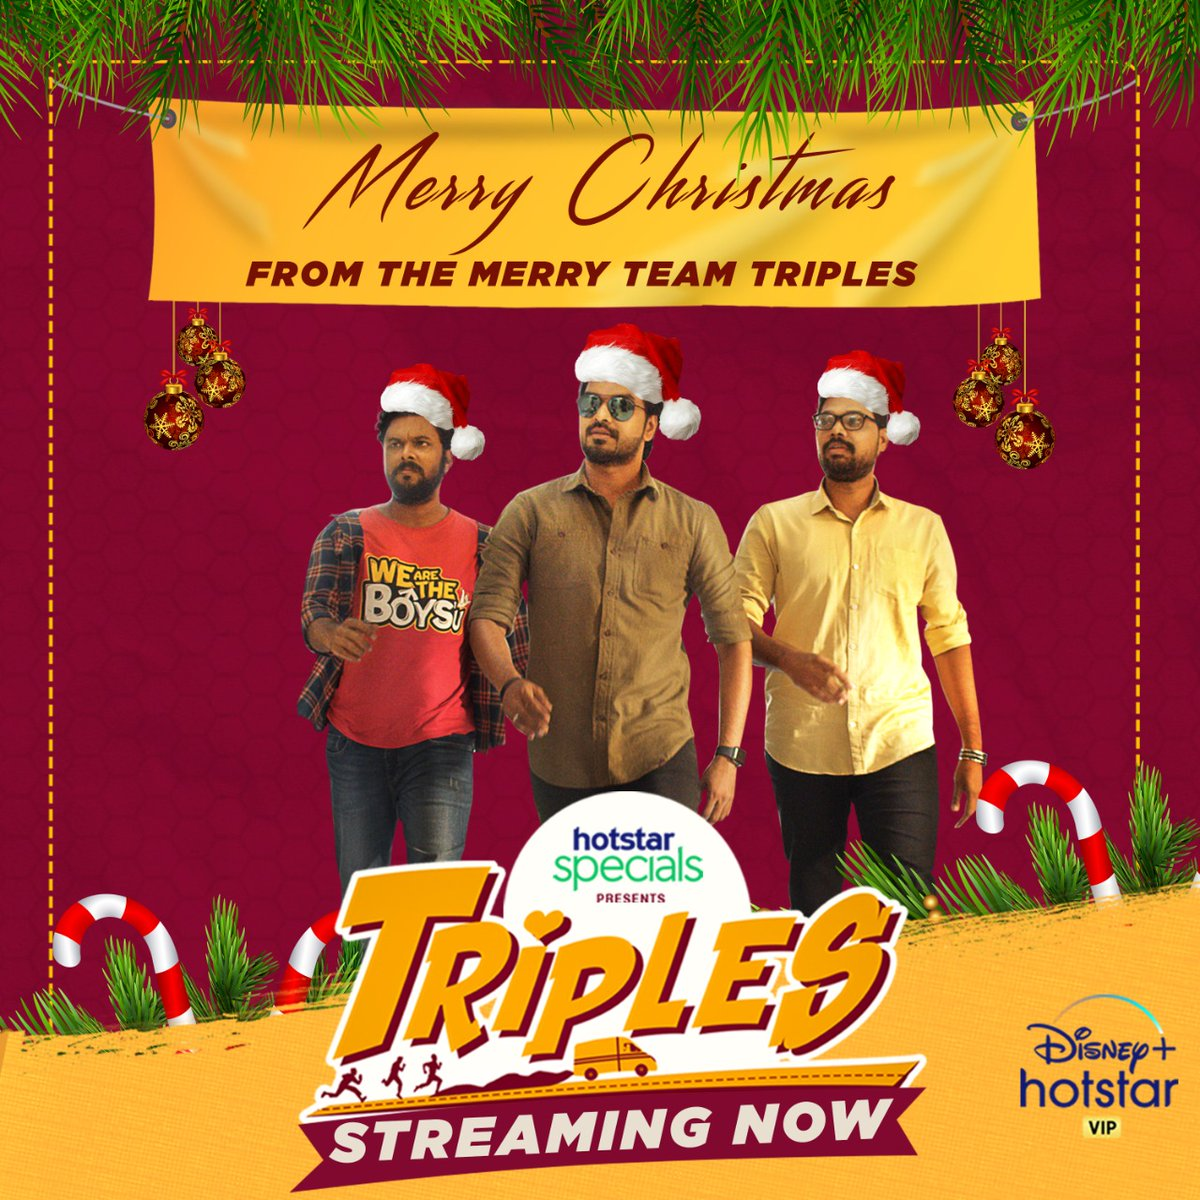 Jingle bells🎊🔔.. Jingle bells🛎🎋.. #Triples👫➕🙋 all the way‼️  Ho., Ho., Ho🎅., Celebrate this holiday🍪 season with the 'Triples'😄 only on @DisneyplusHSVIP📺🌟..  #triplesthefun #Jai #VaniBhojan @karthiksubbaraj @CharukeshSekar @kalyanshankar @Actor_Jai @vanibhojanoffl